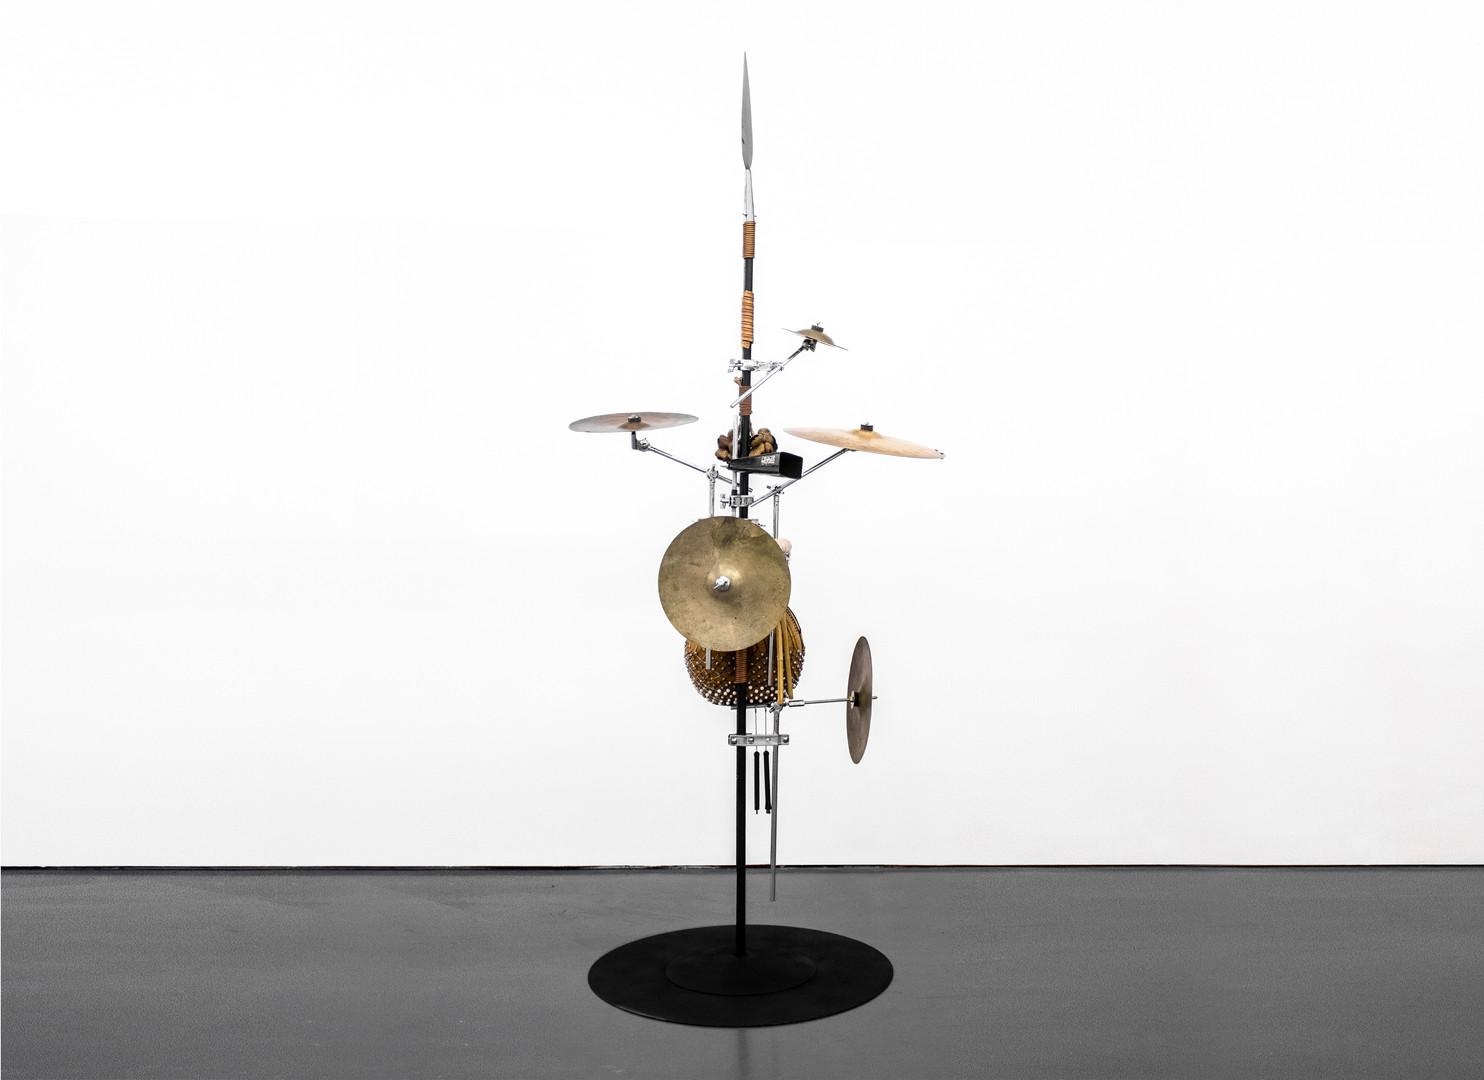 Masimba Hwati | Sokunge 4 | 2019 | Steel Pipe, Brass and Found Objects | 257 x 106 x 85 cm